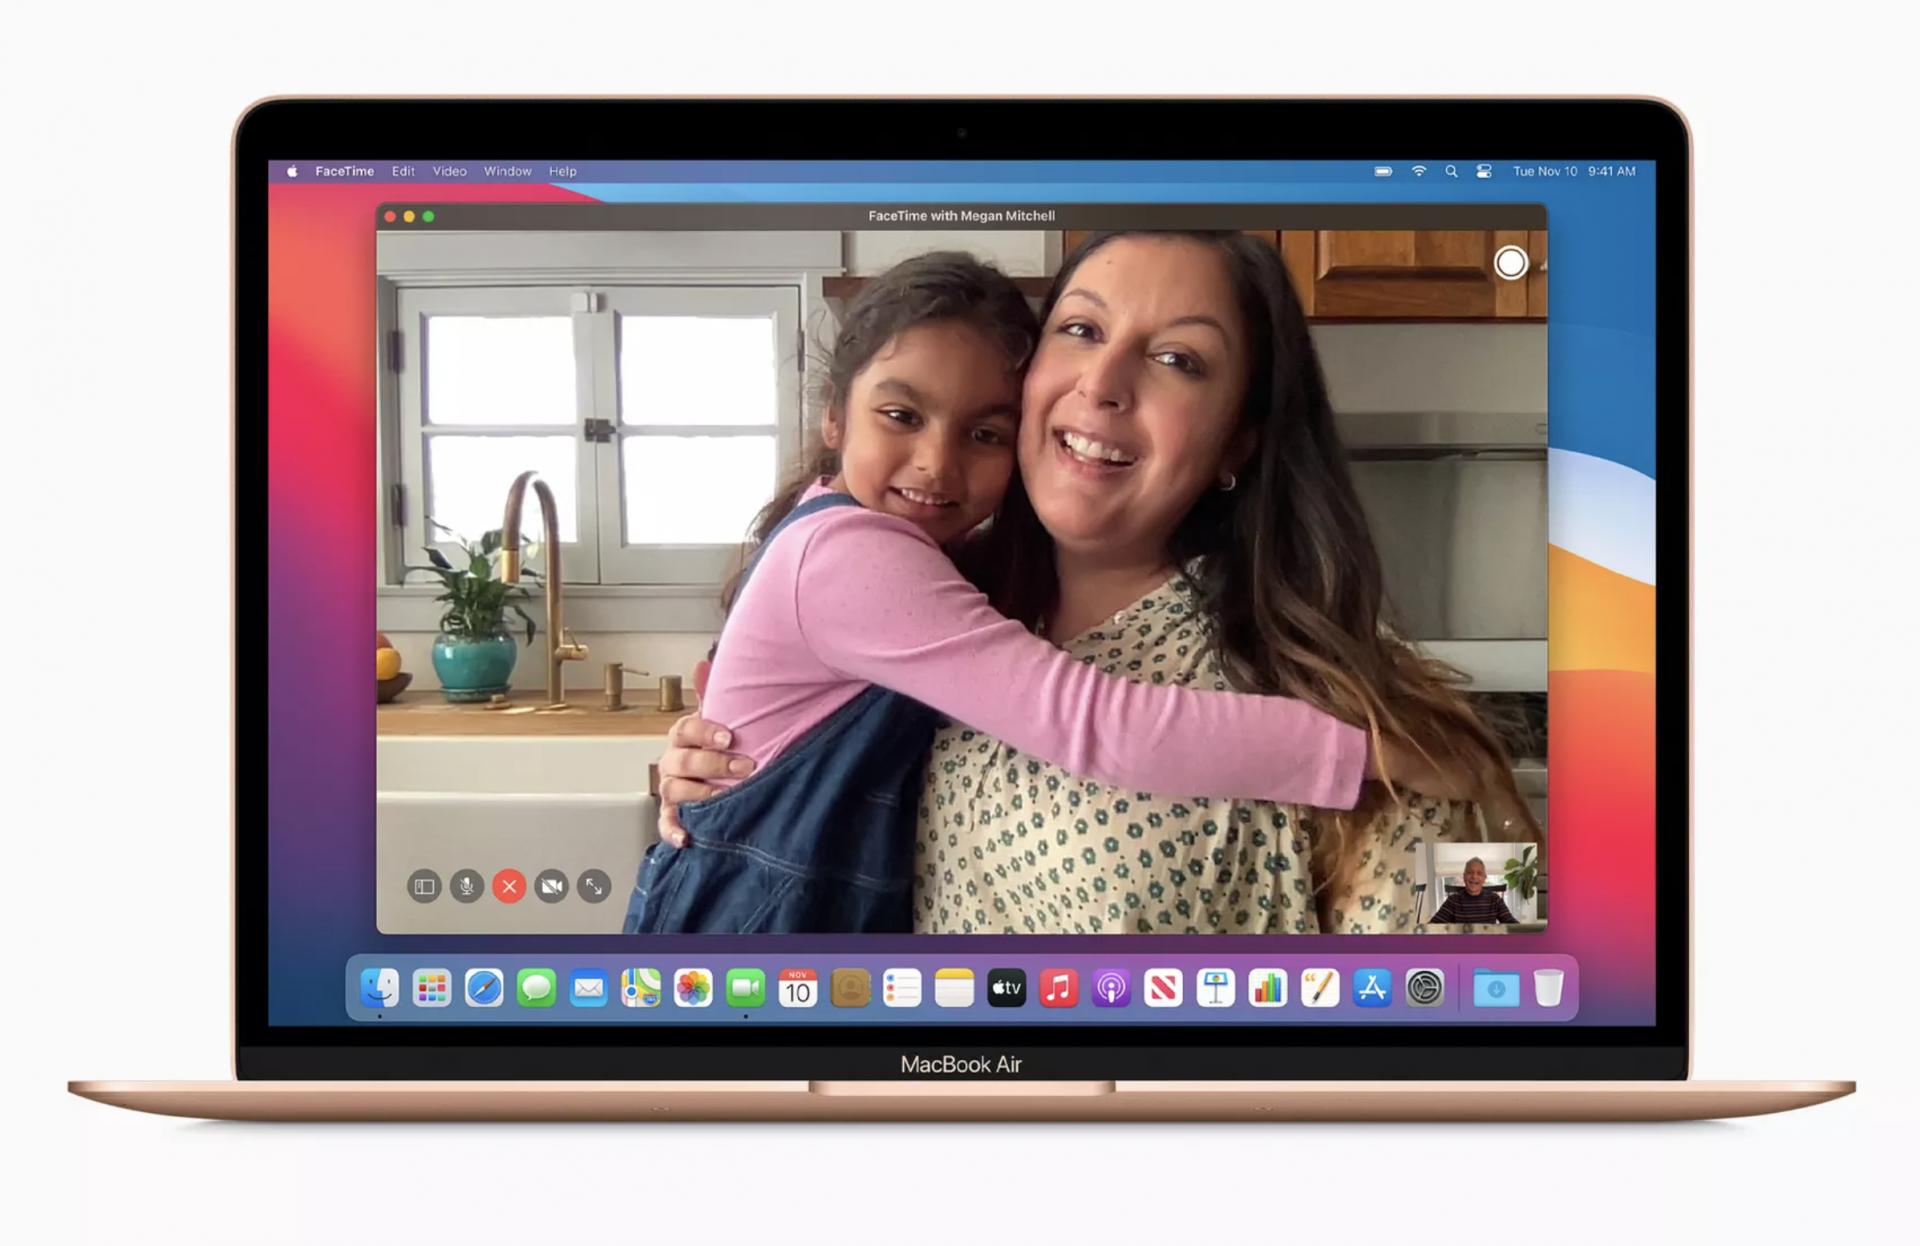 Macbook Air 2020 13 inch Apple M1 - Silver - 8GB RAM 256GB SSD - MGN93